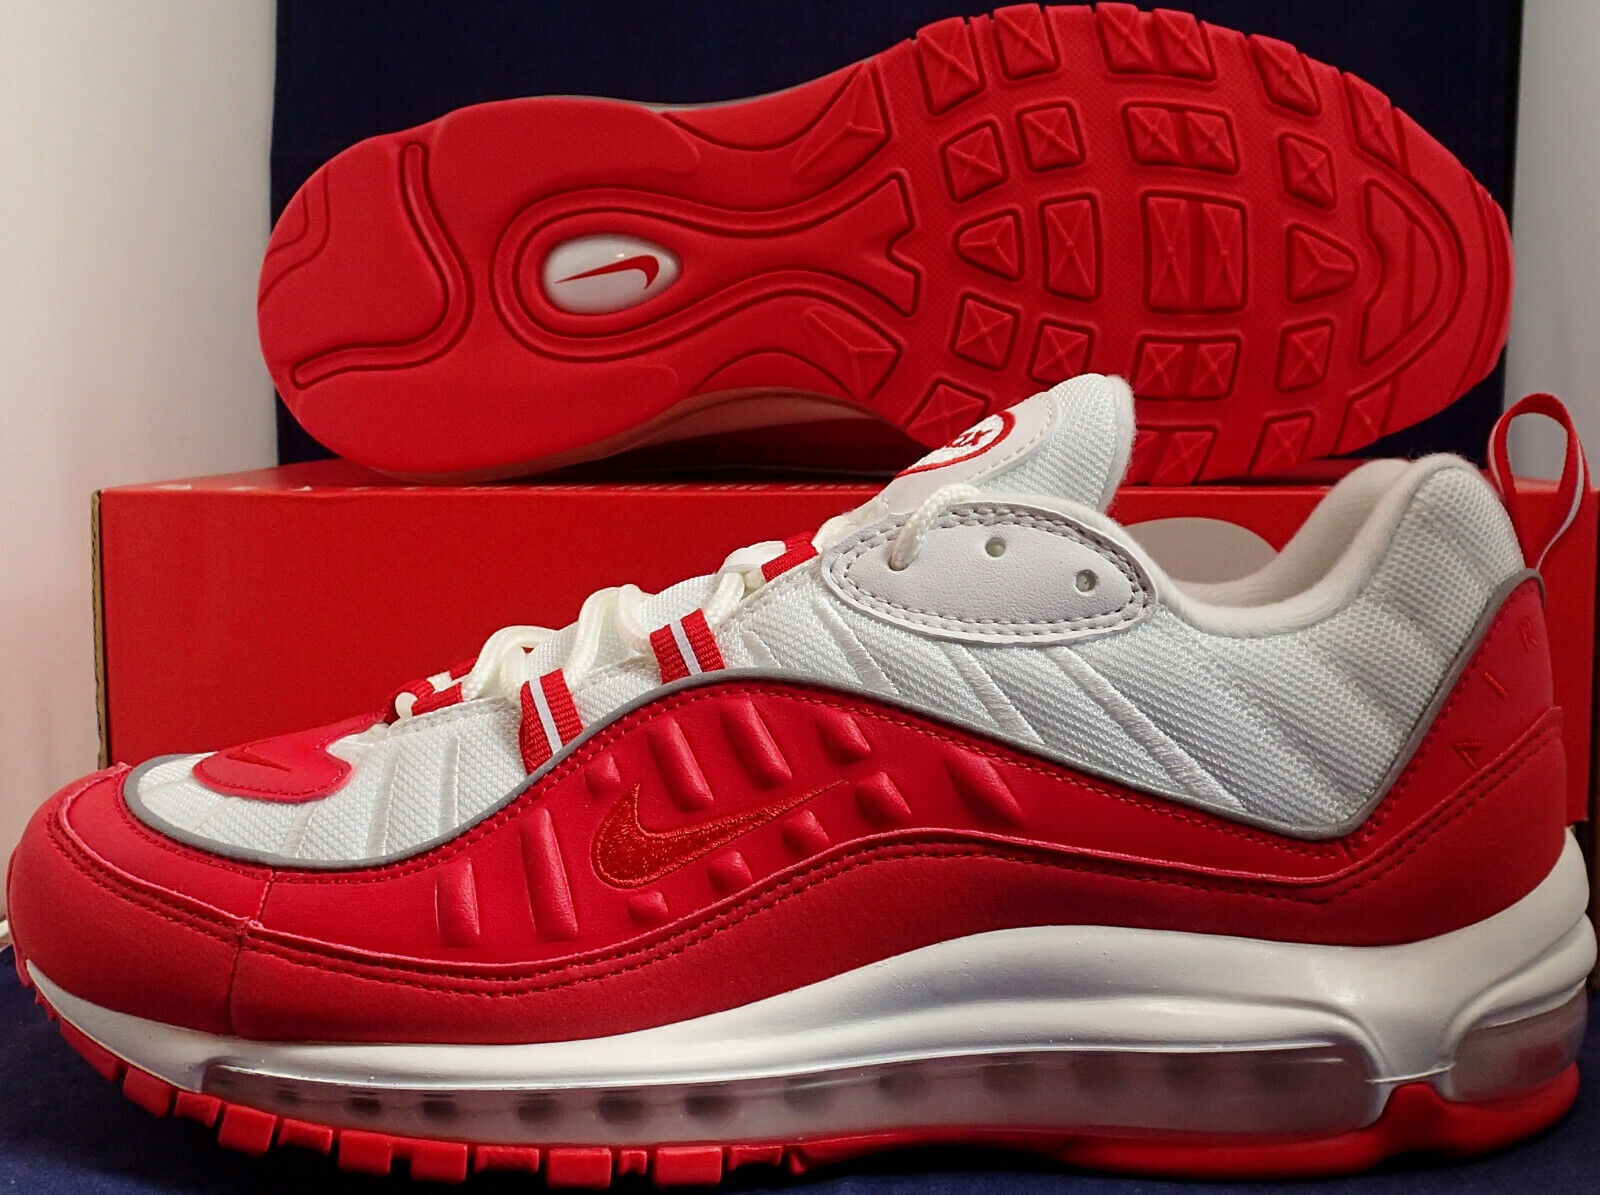 Nike Air Max 98 Universidad rosso  biancao Dimensione 10 (640744 -602)  qualità autentica